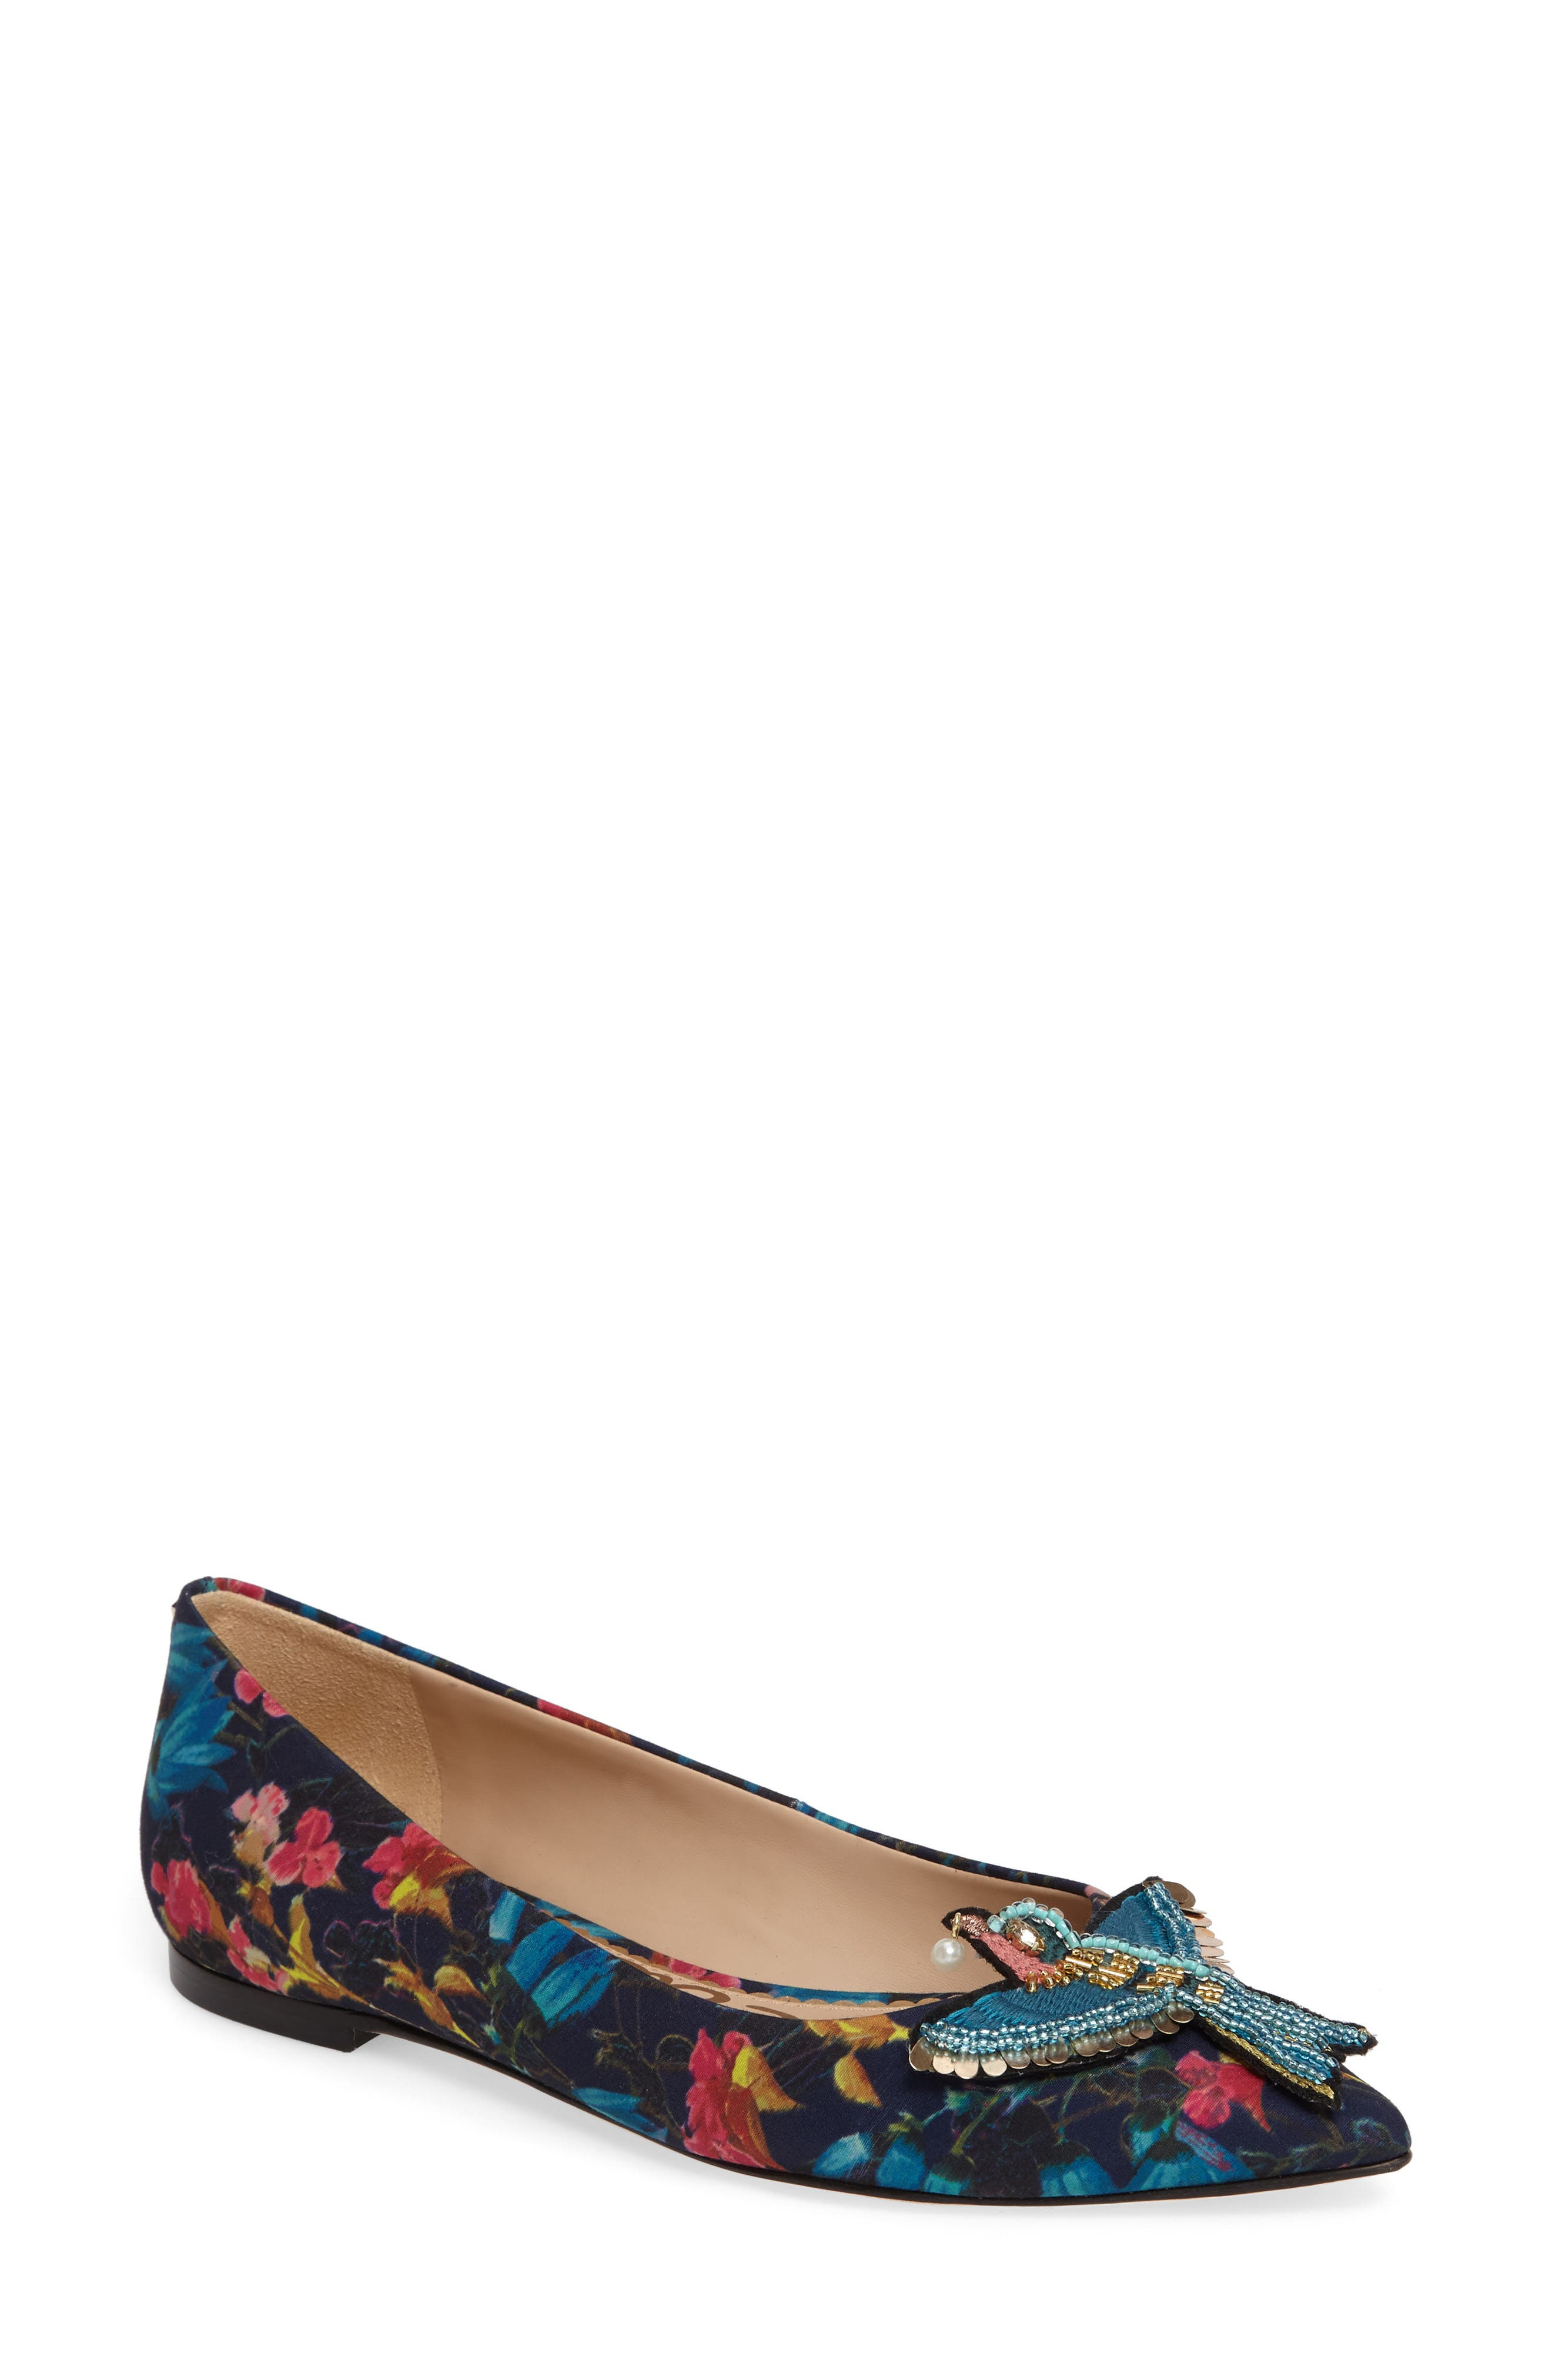 Alternate Image 1 Selected - Sam Edelman Rafaella Pointy Toe Ballet Flat (Women)